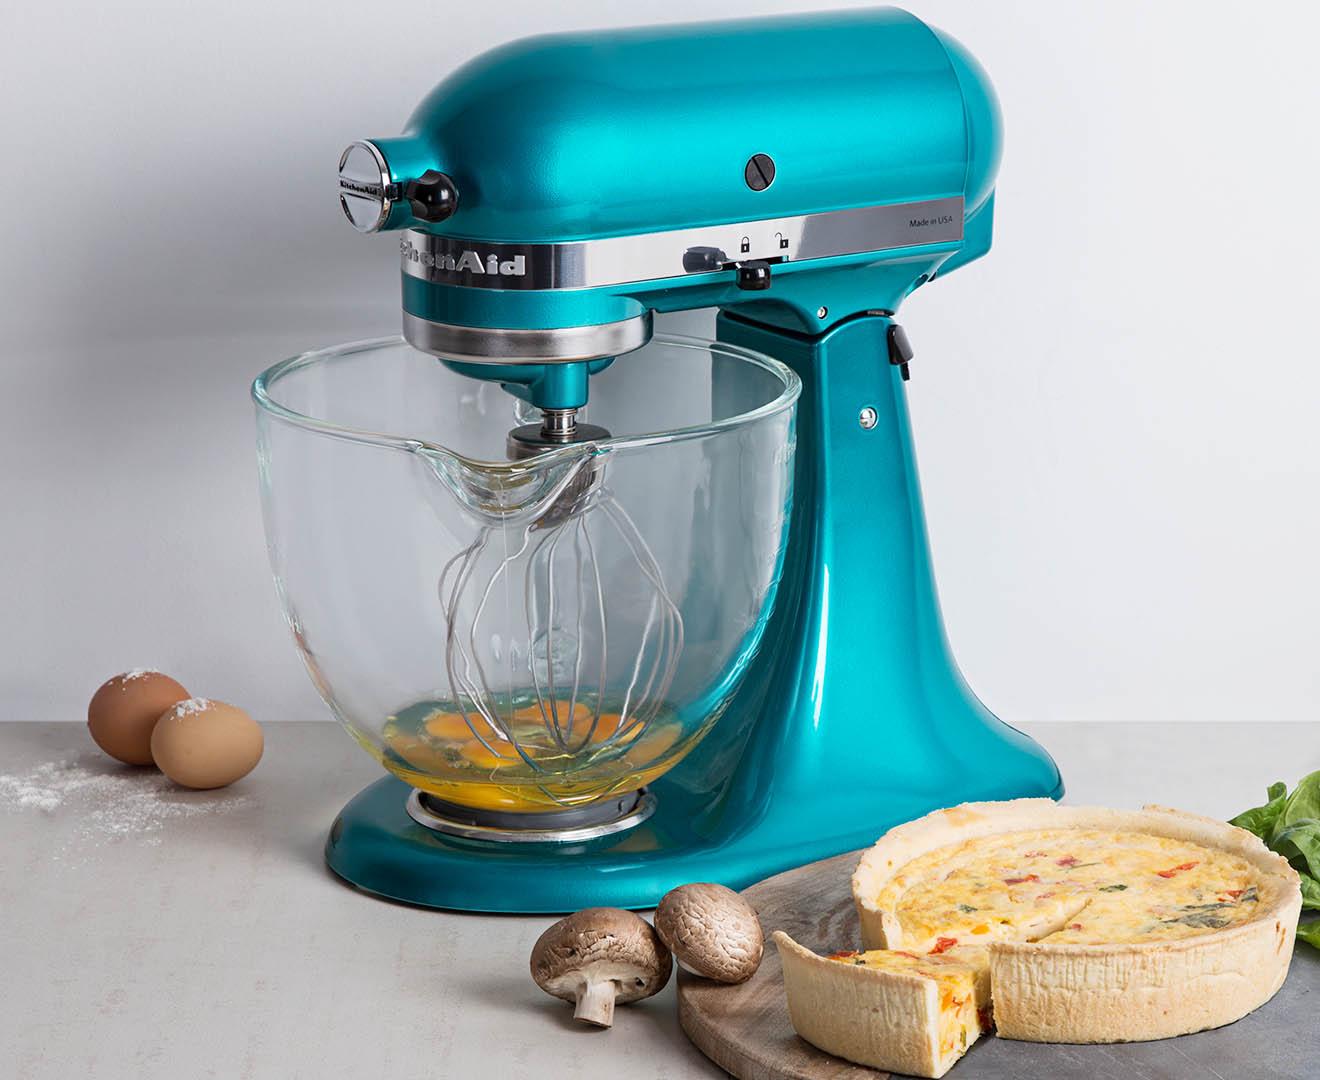 KitchenAid KSM155 Artisan Stand Mixer - Sea Glass | Catch.com.au